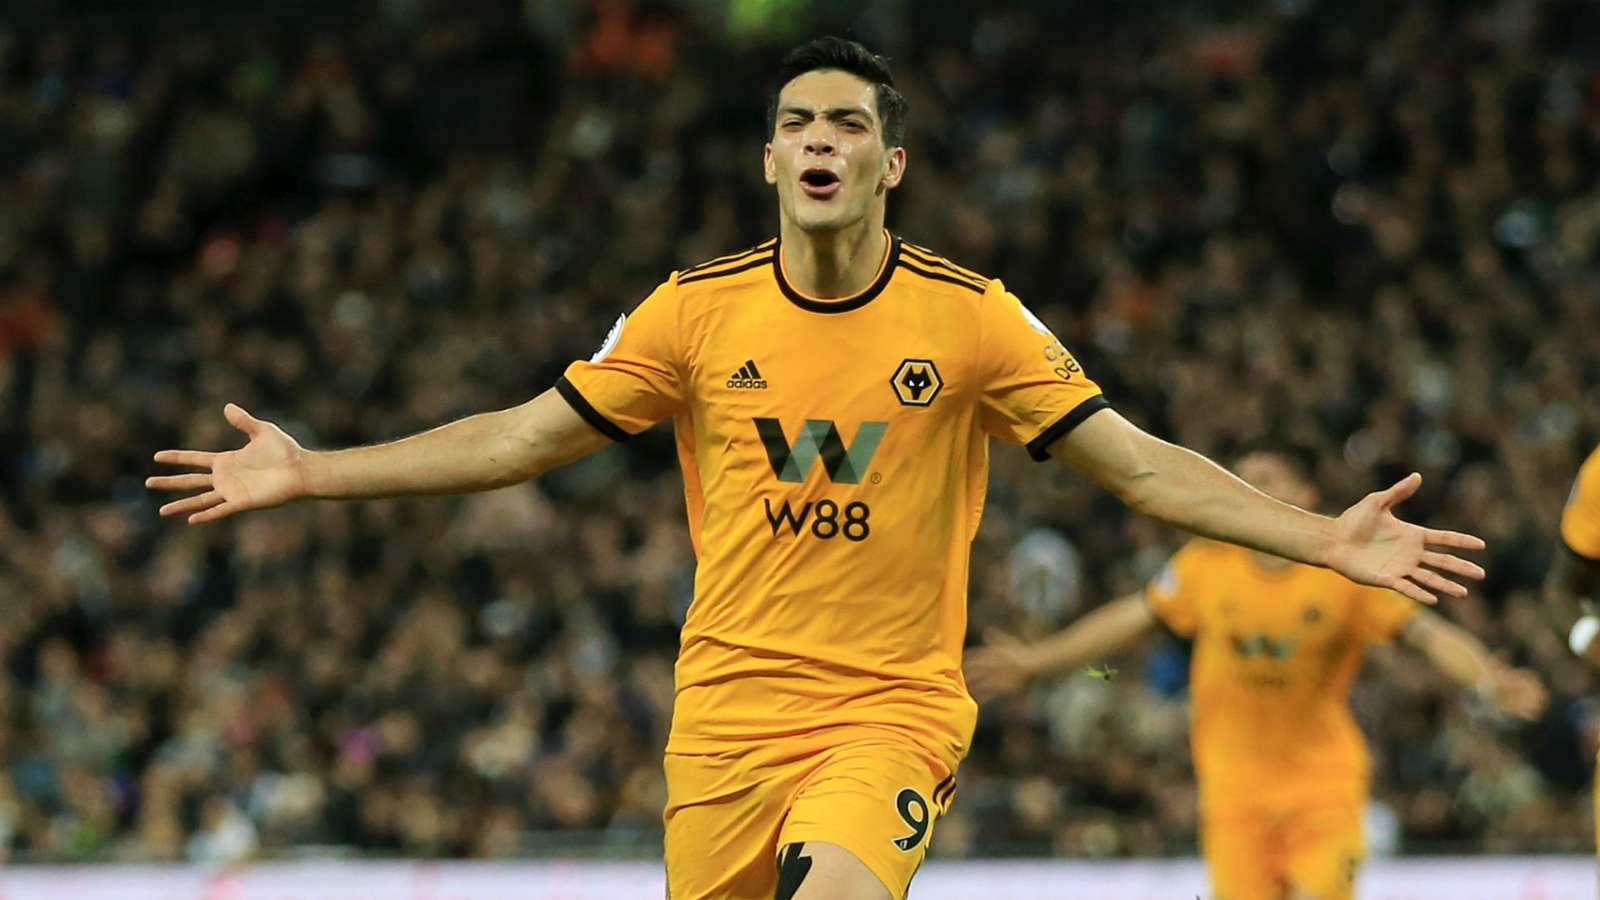 jimenez cropped iwevcaxq7vmt1i6untbhpnb0j - Tottenham vs Wolves 1-3: Premier League Highlights [Video]